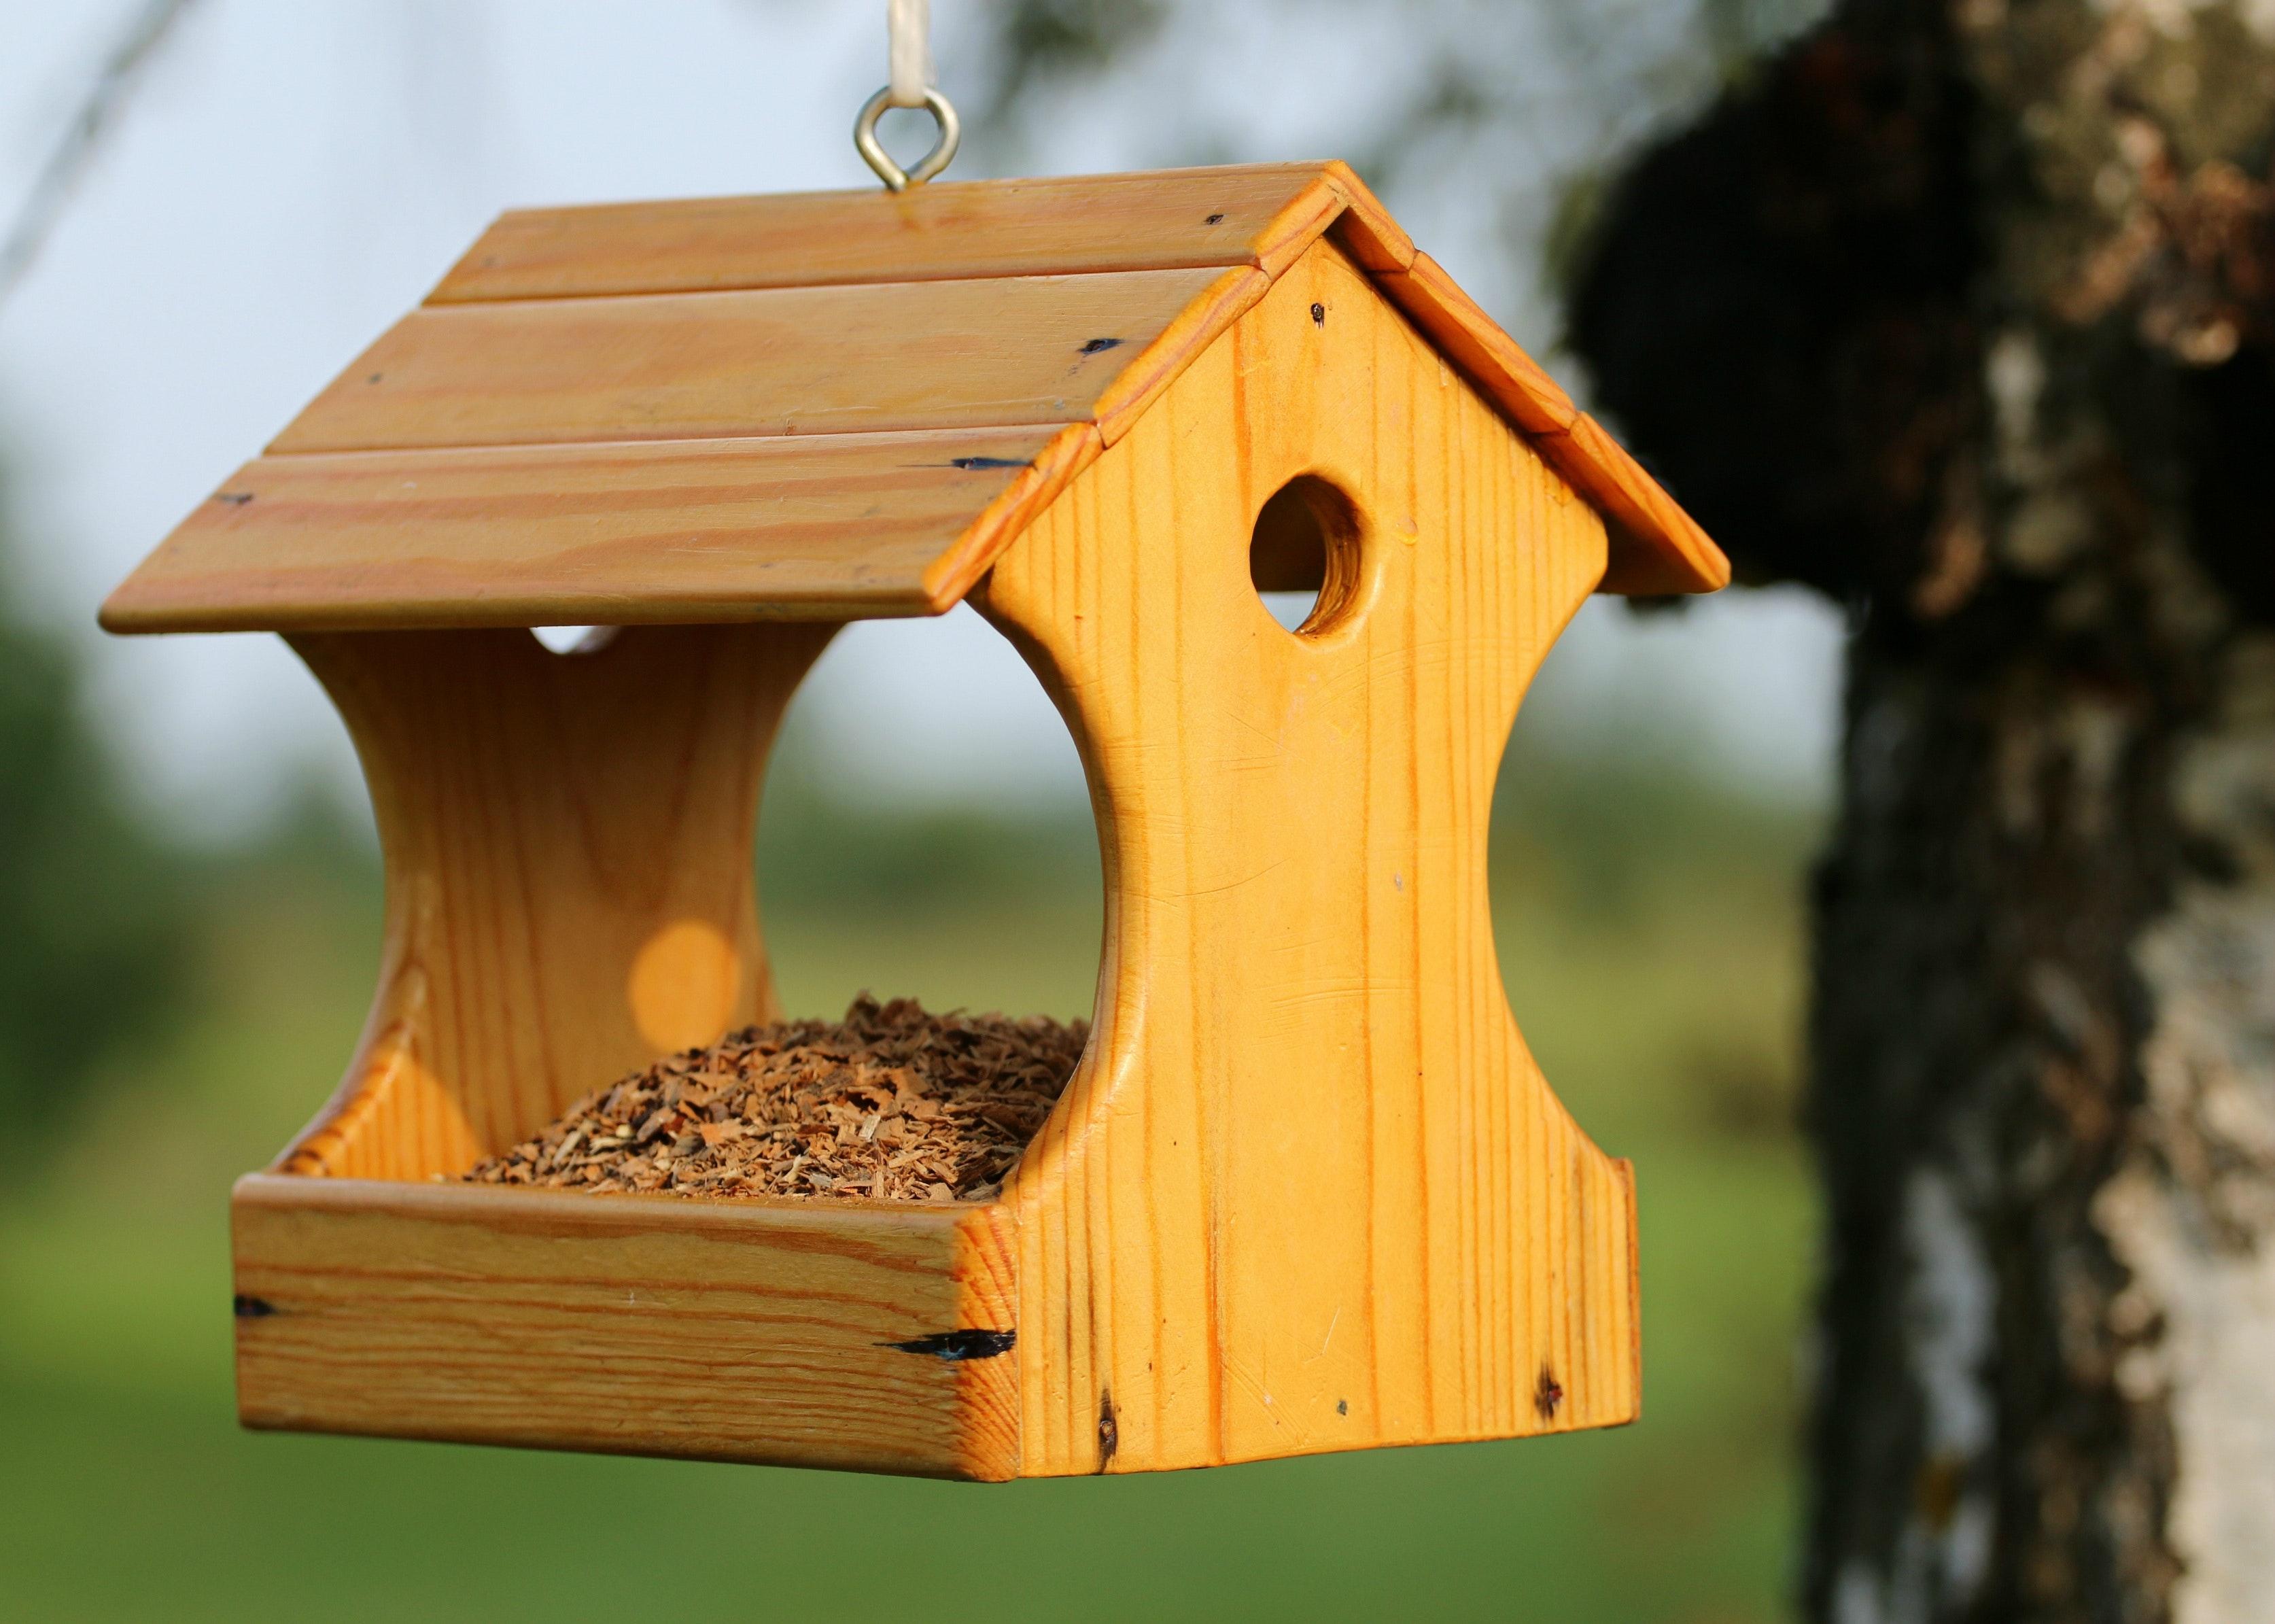 Superb Brown Wooden Bird House Hanging On Tree Free Stock Photo Download Free Architecture Designs Scobabritishbridgeorg